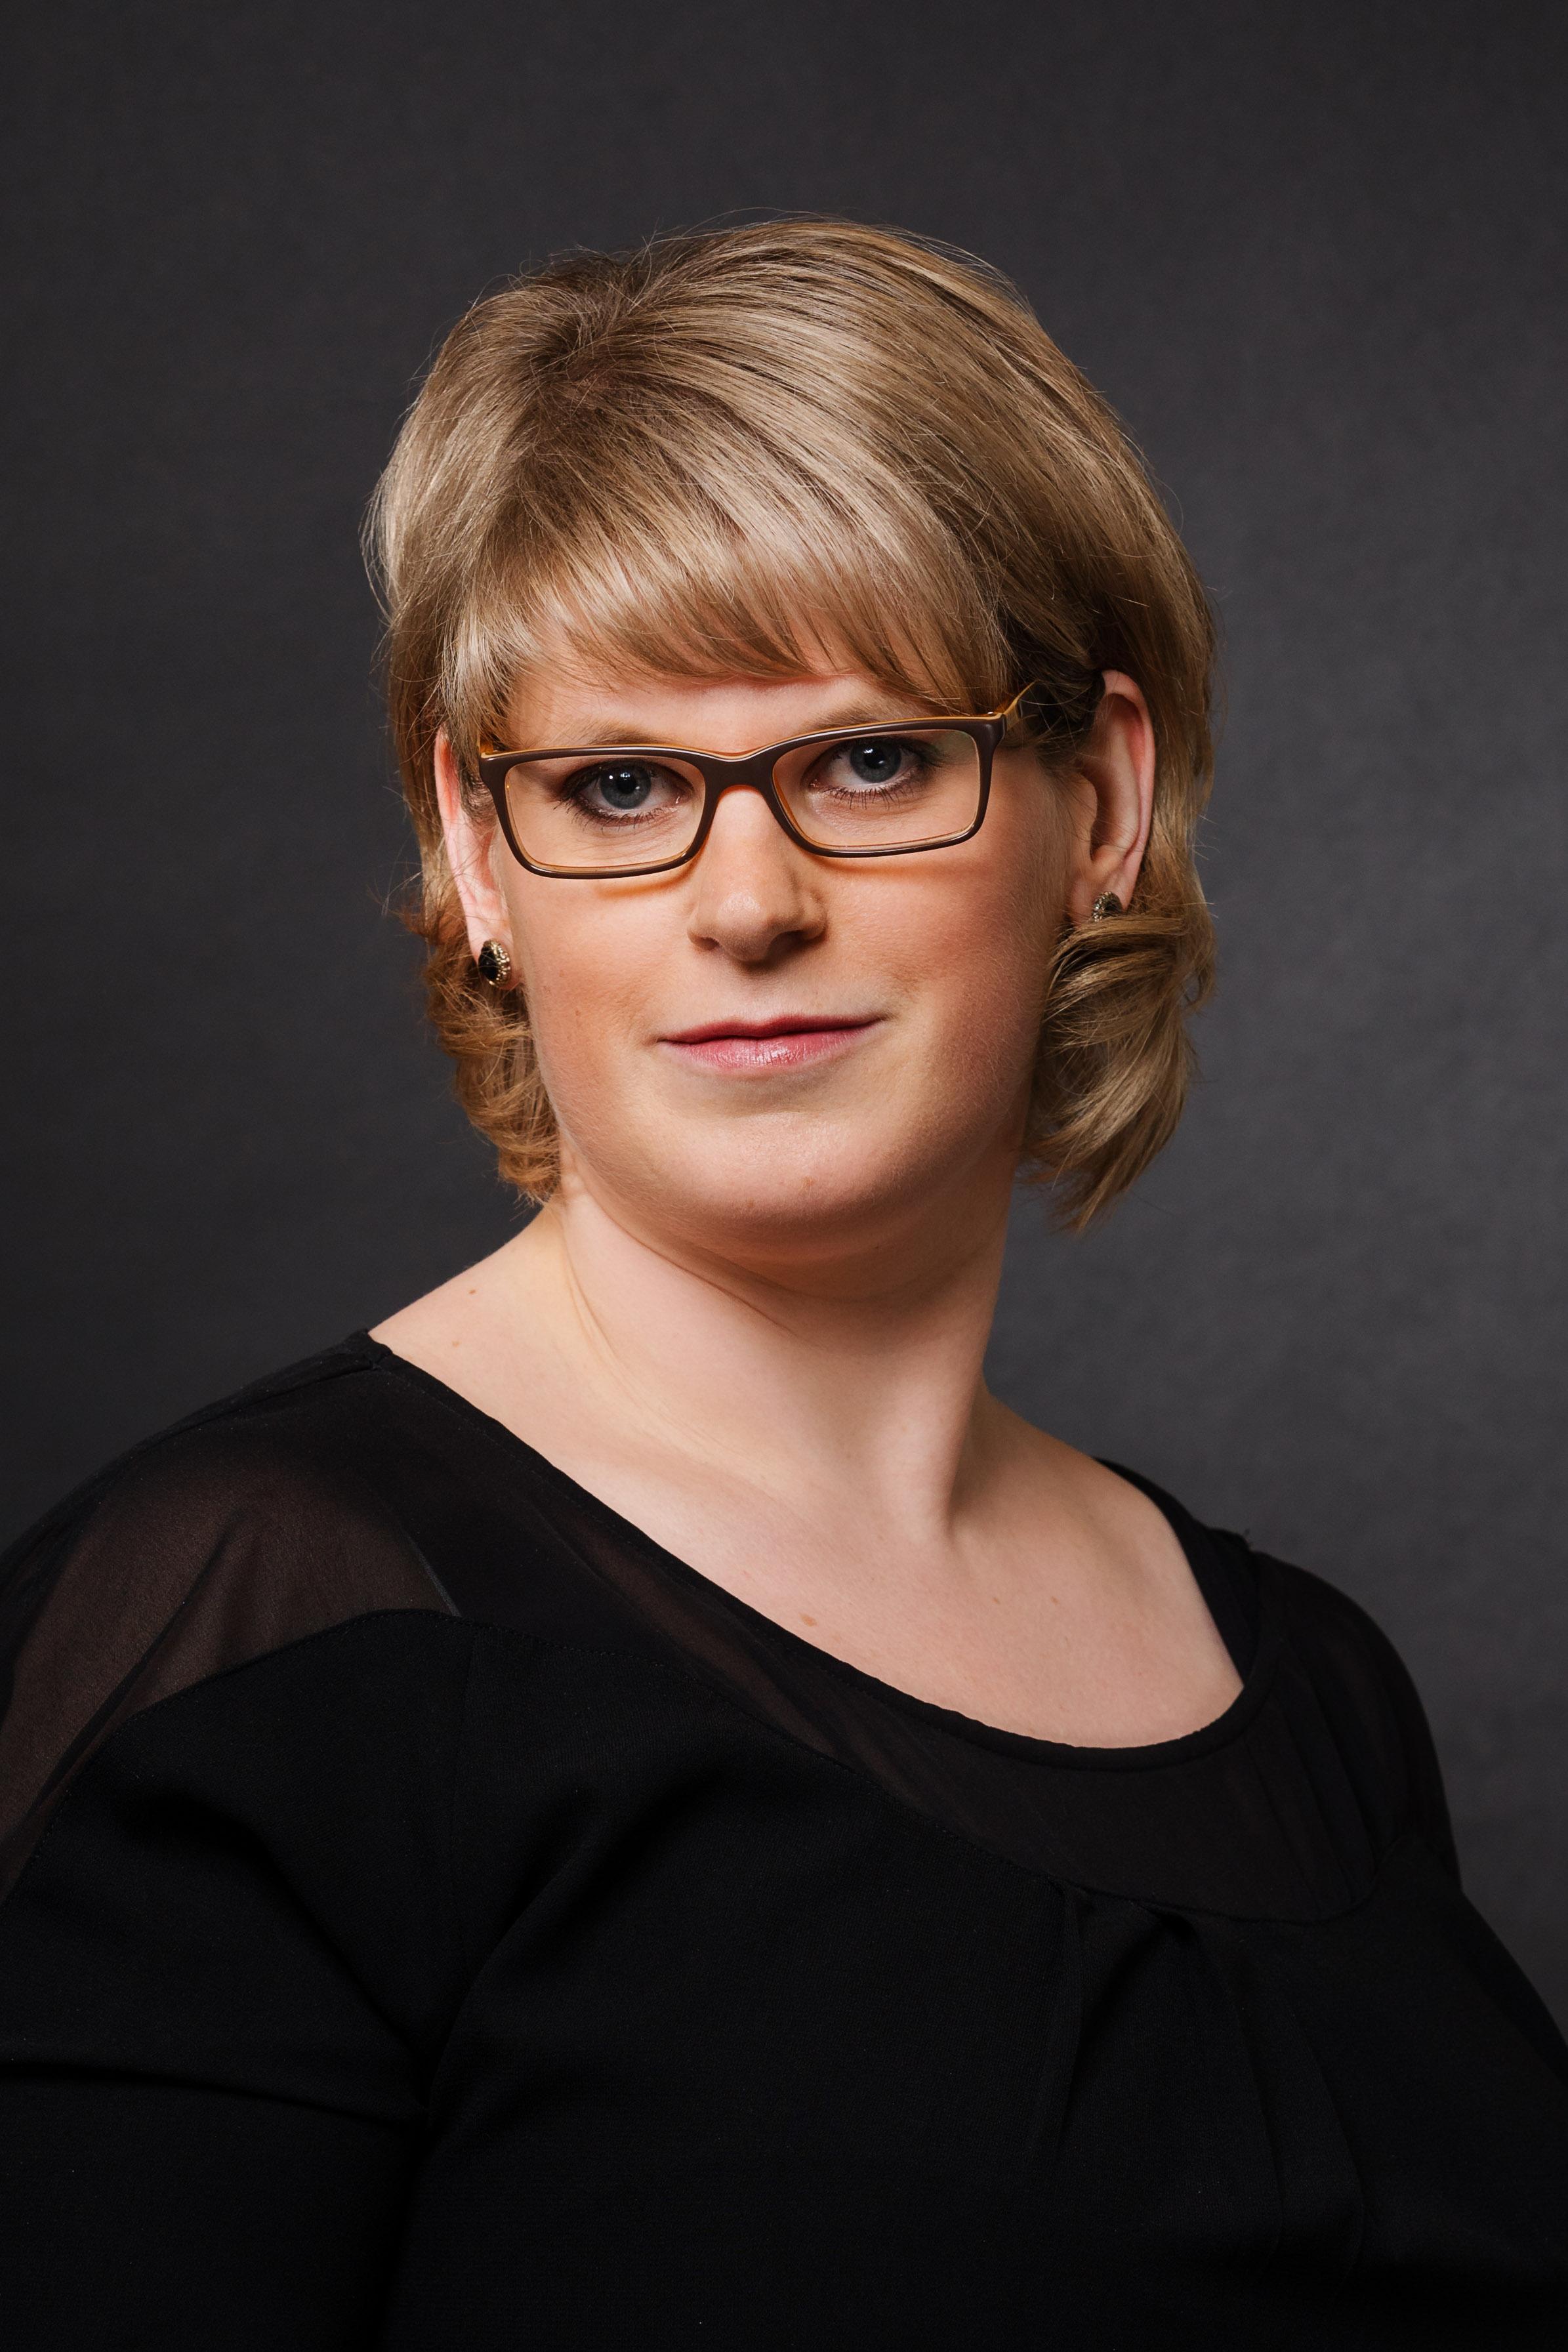 Nicole Rübsam